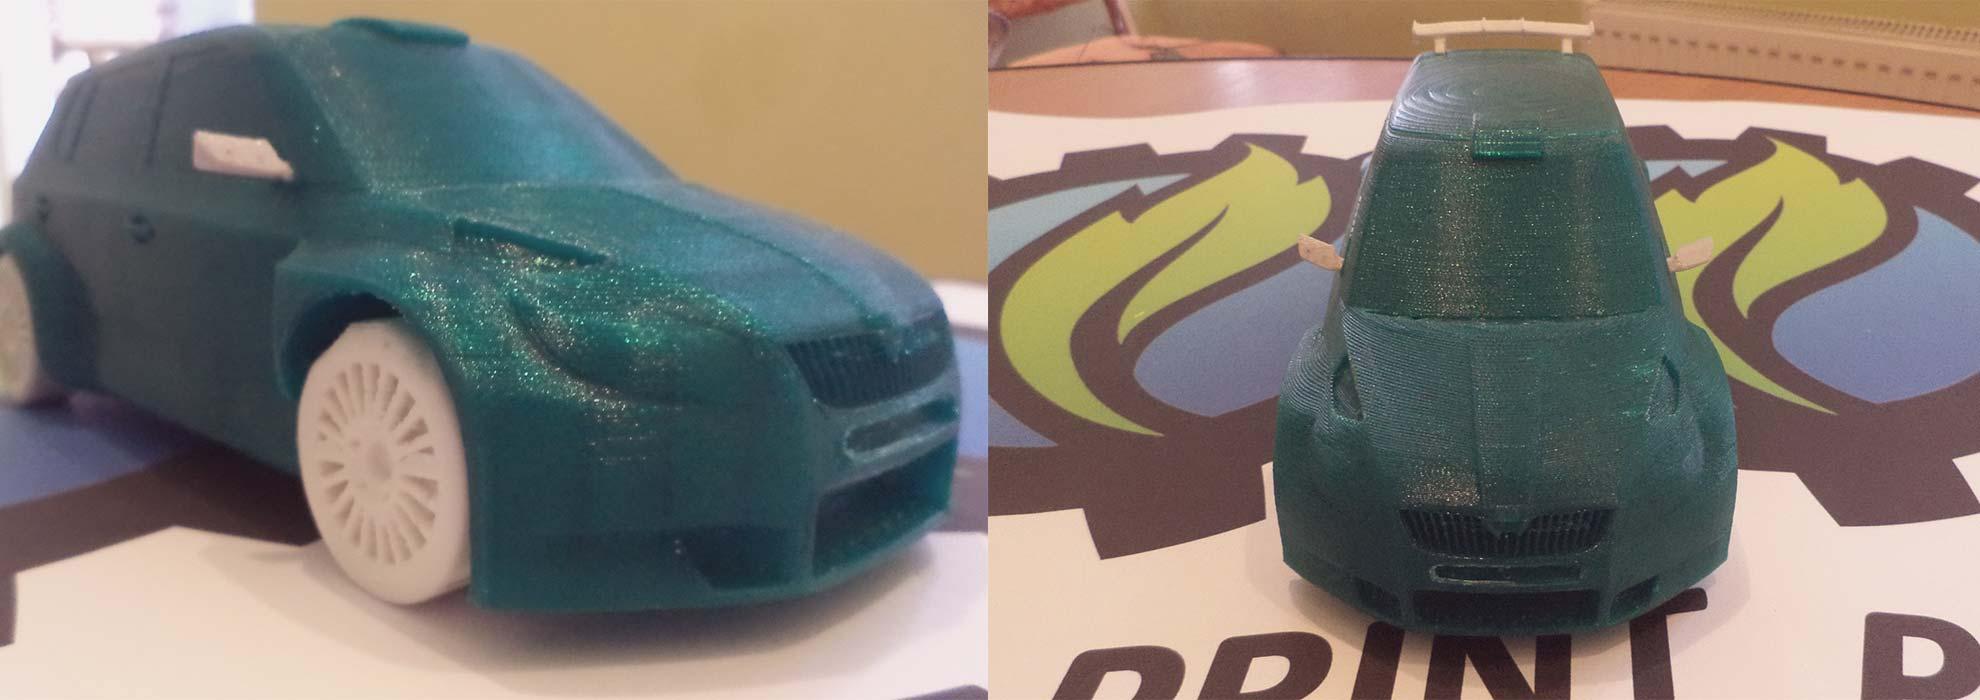 Уменьшенная копия автомобиля Skoda